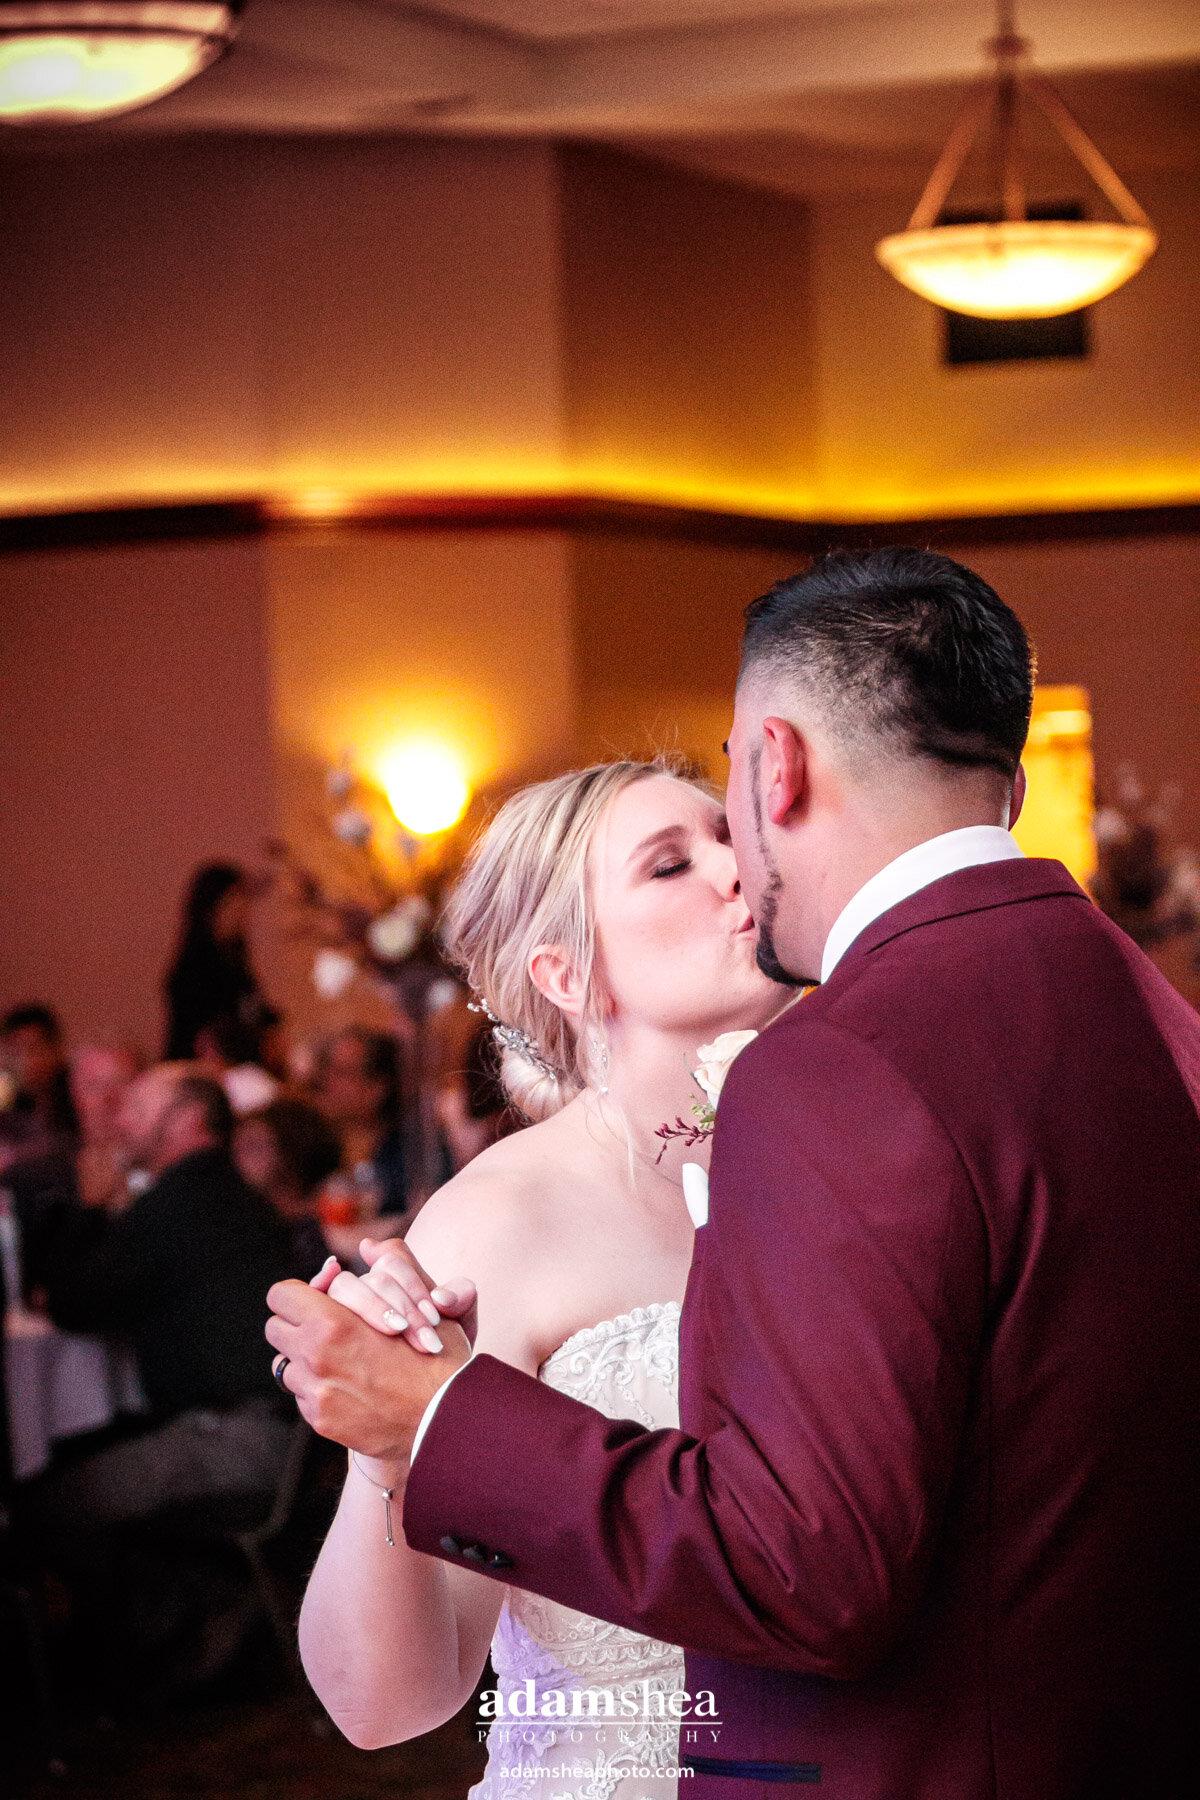 Taylor-Favian-Wedding-Menasha-WI-Waverly-Beach-Adam-Shea-Photography00004.jpg